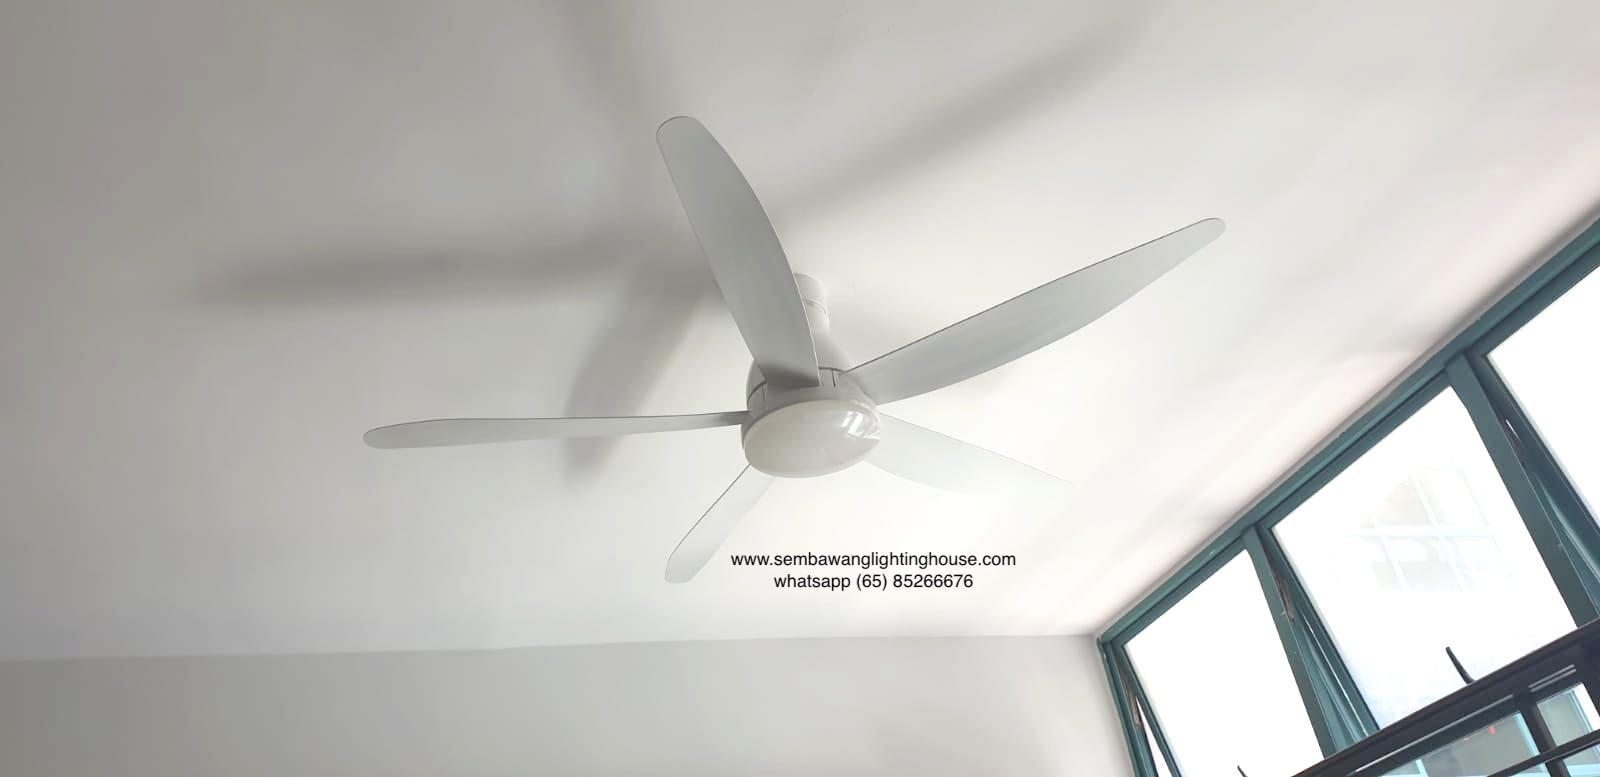 kdk-u60fw-white-ceiling-fan-sembawang-lighting-house-sample-15.jpg